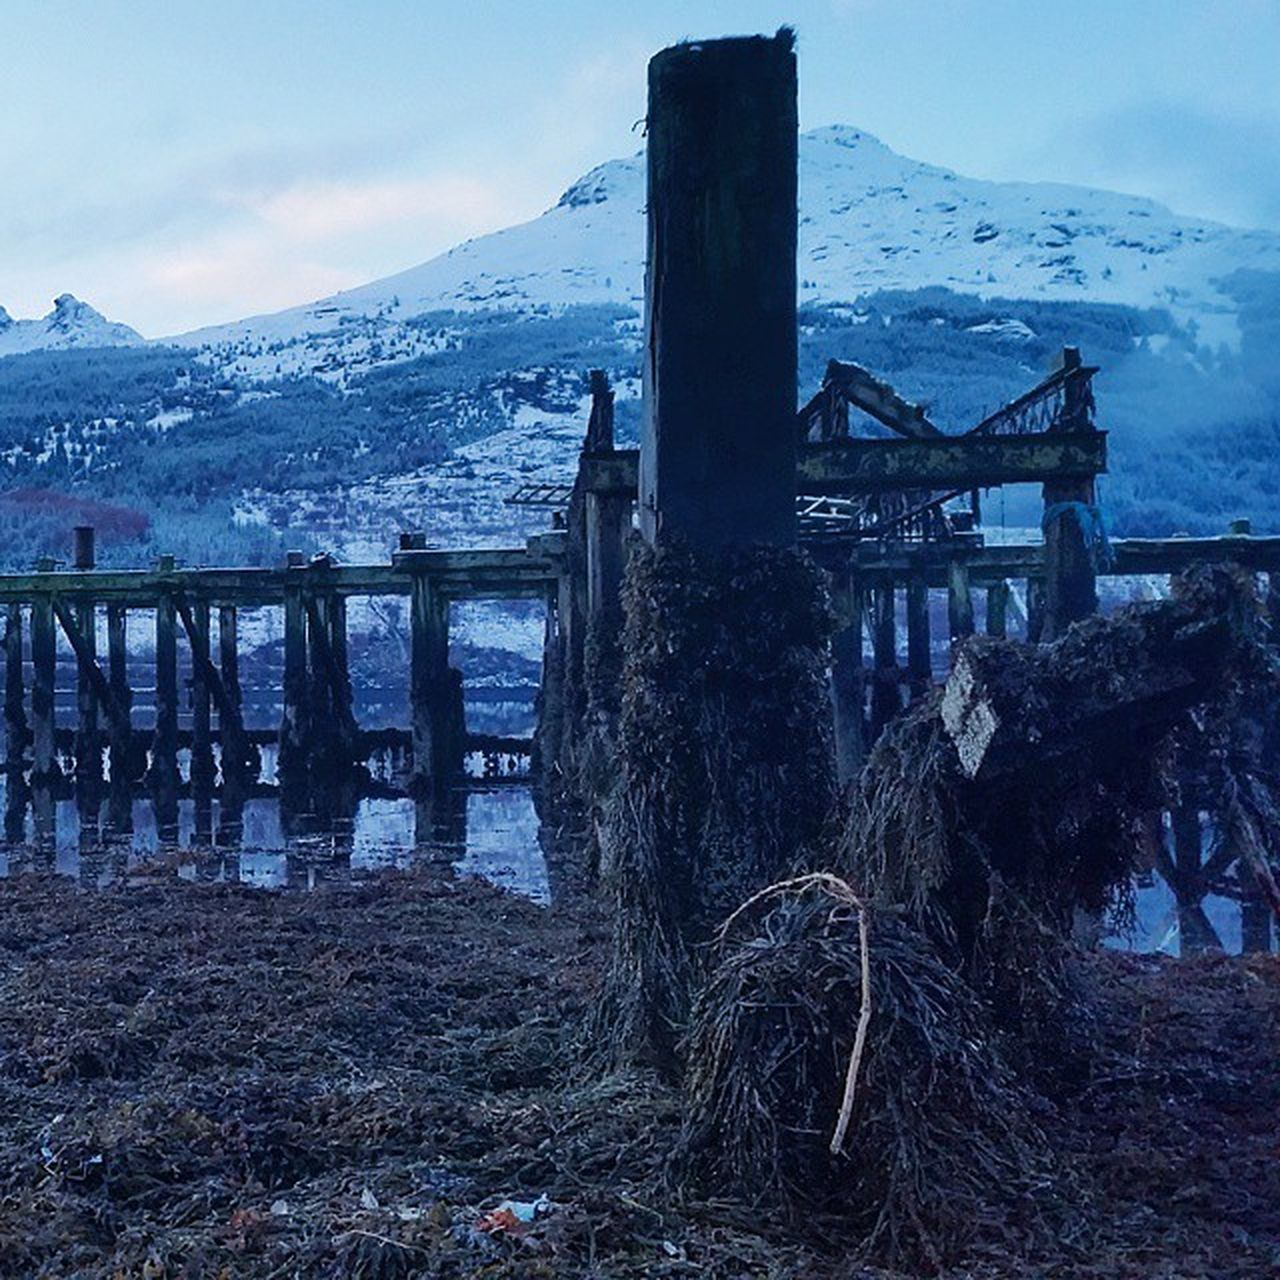 Scotland LochLong Argyll Forest Forestholidays Loch  Wood Seaweed Winterscene Winterpictures Winter Travel Travels Holiday Holidays Scenic Scenicview Tourist